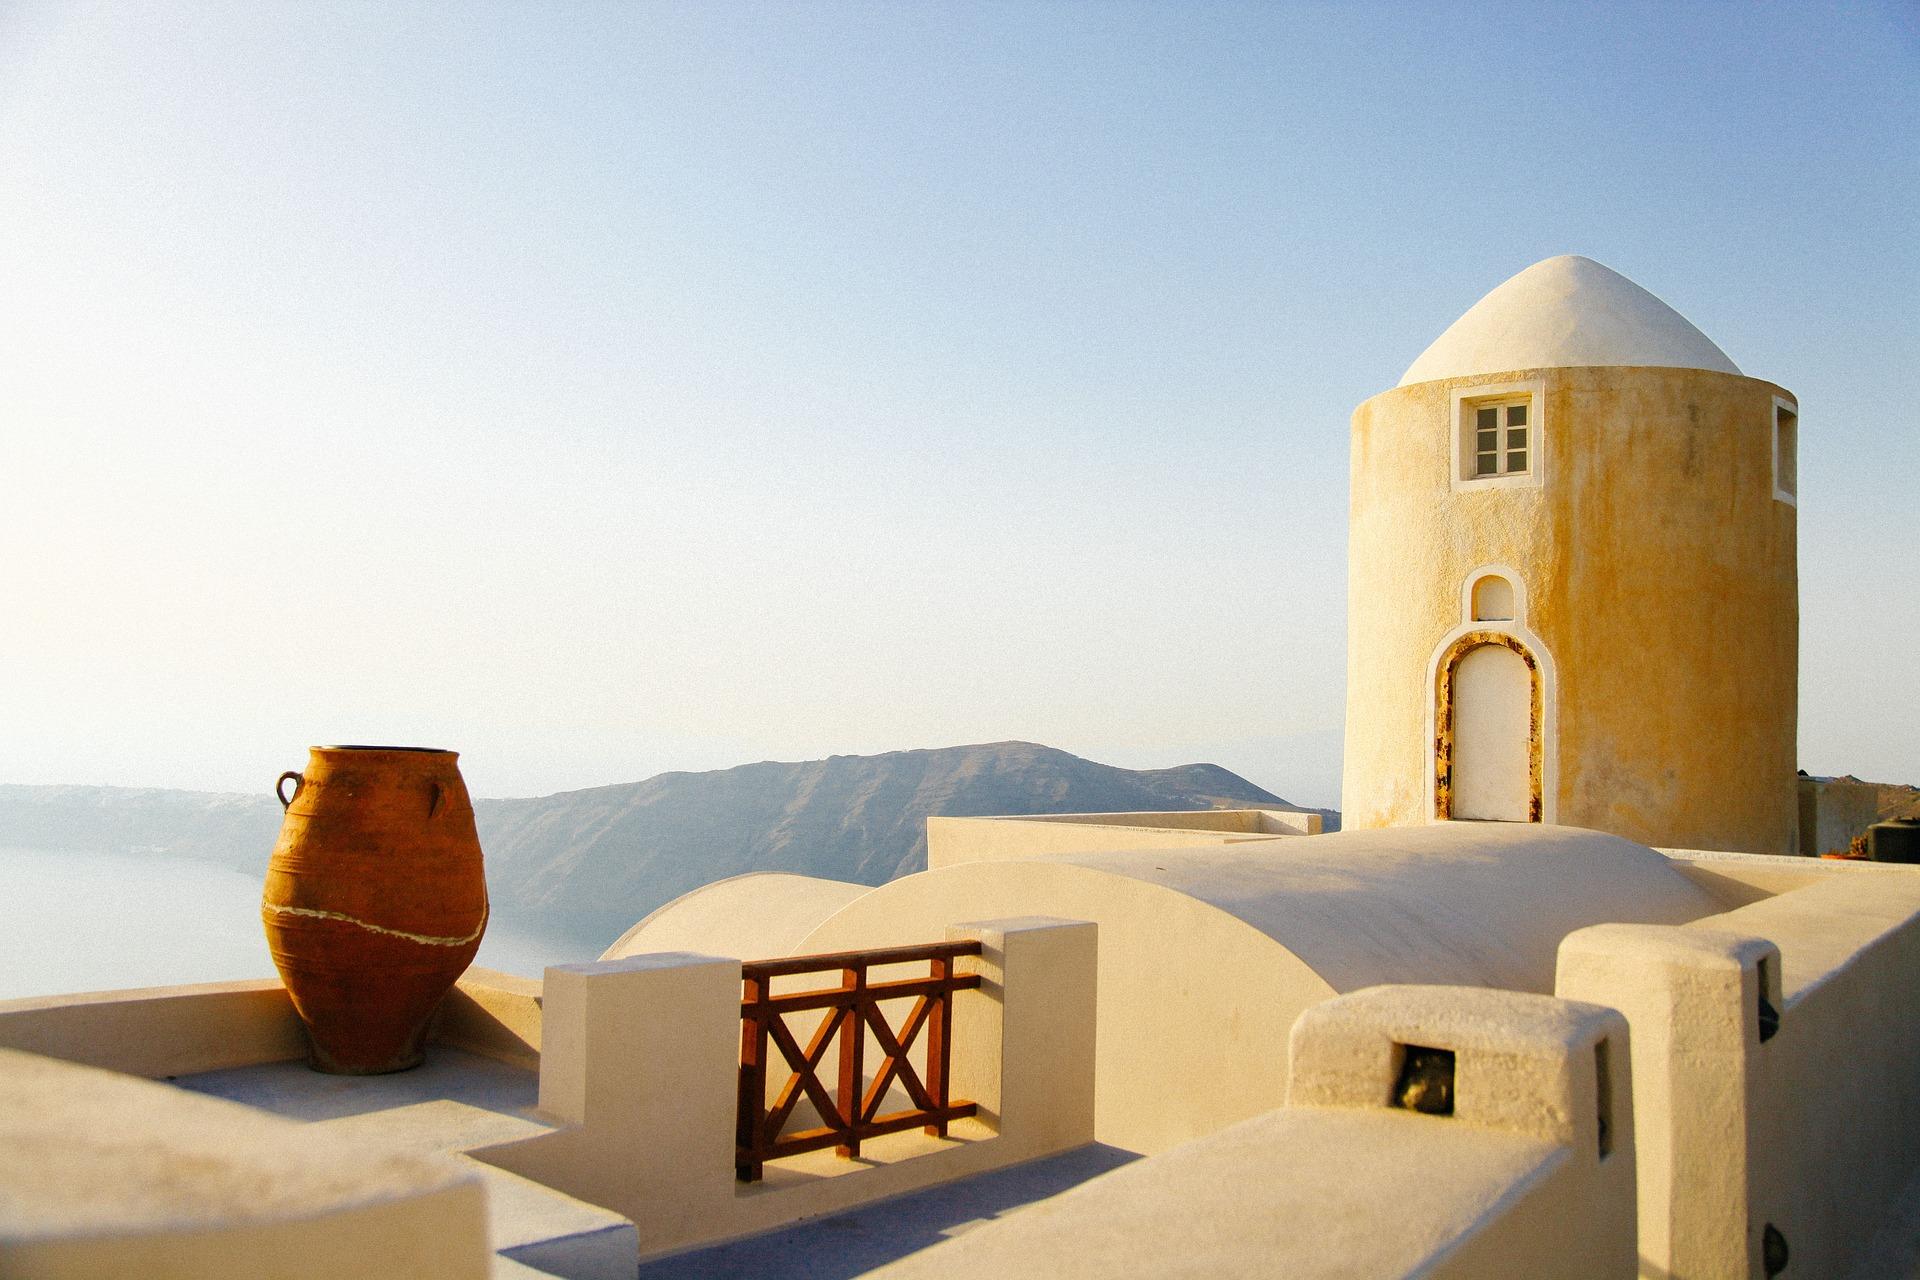 Retsina - The Mediterranean Lifestyle